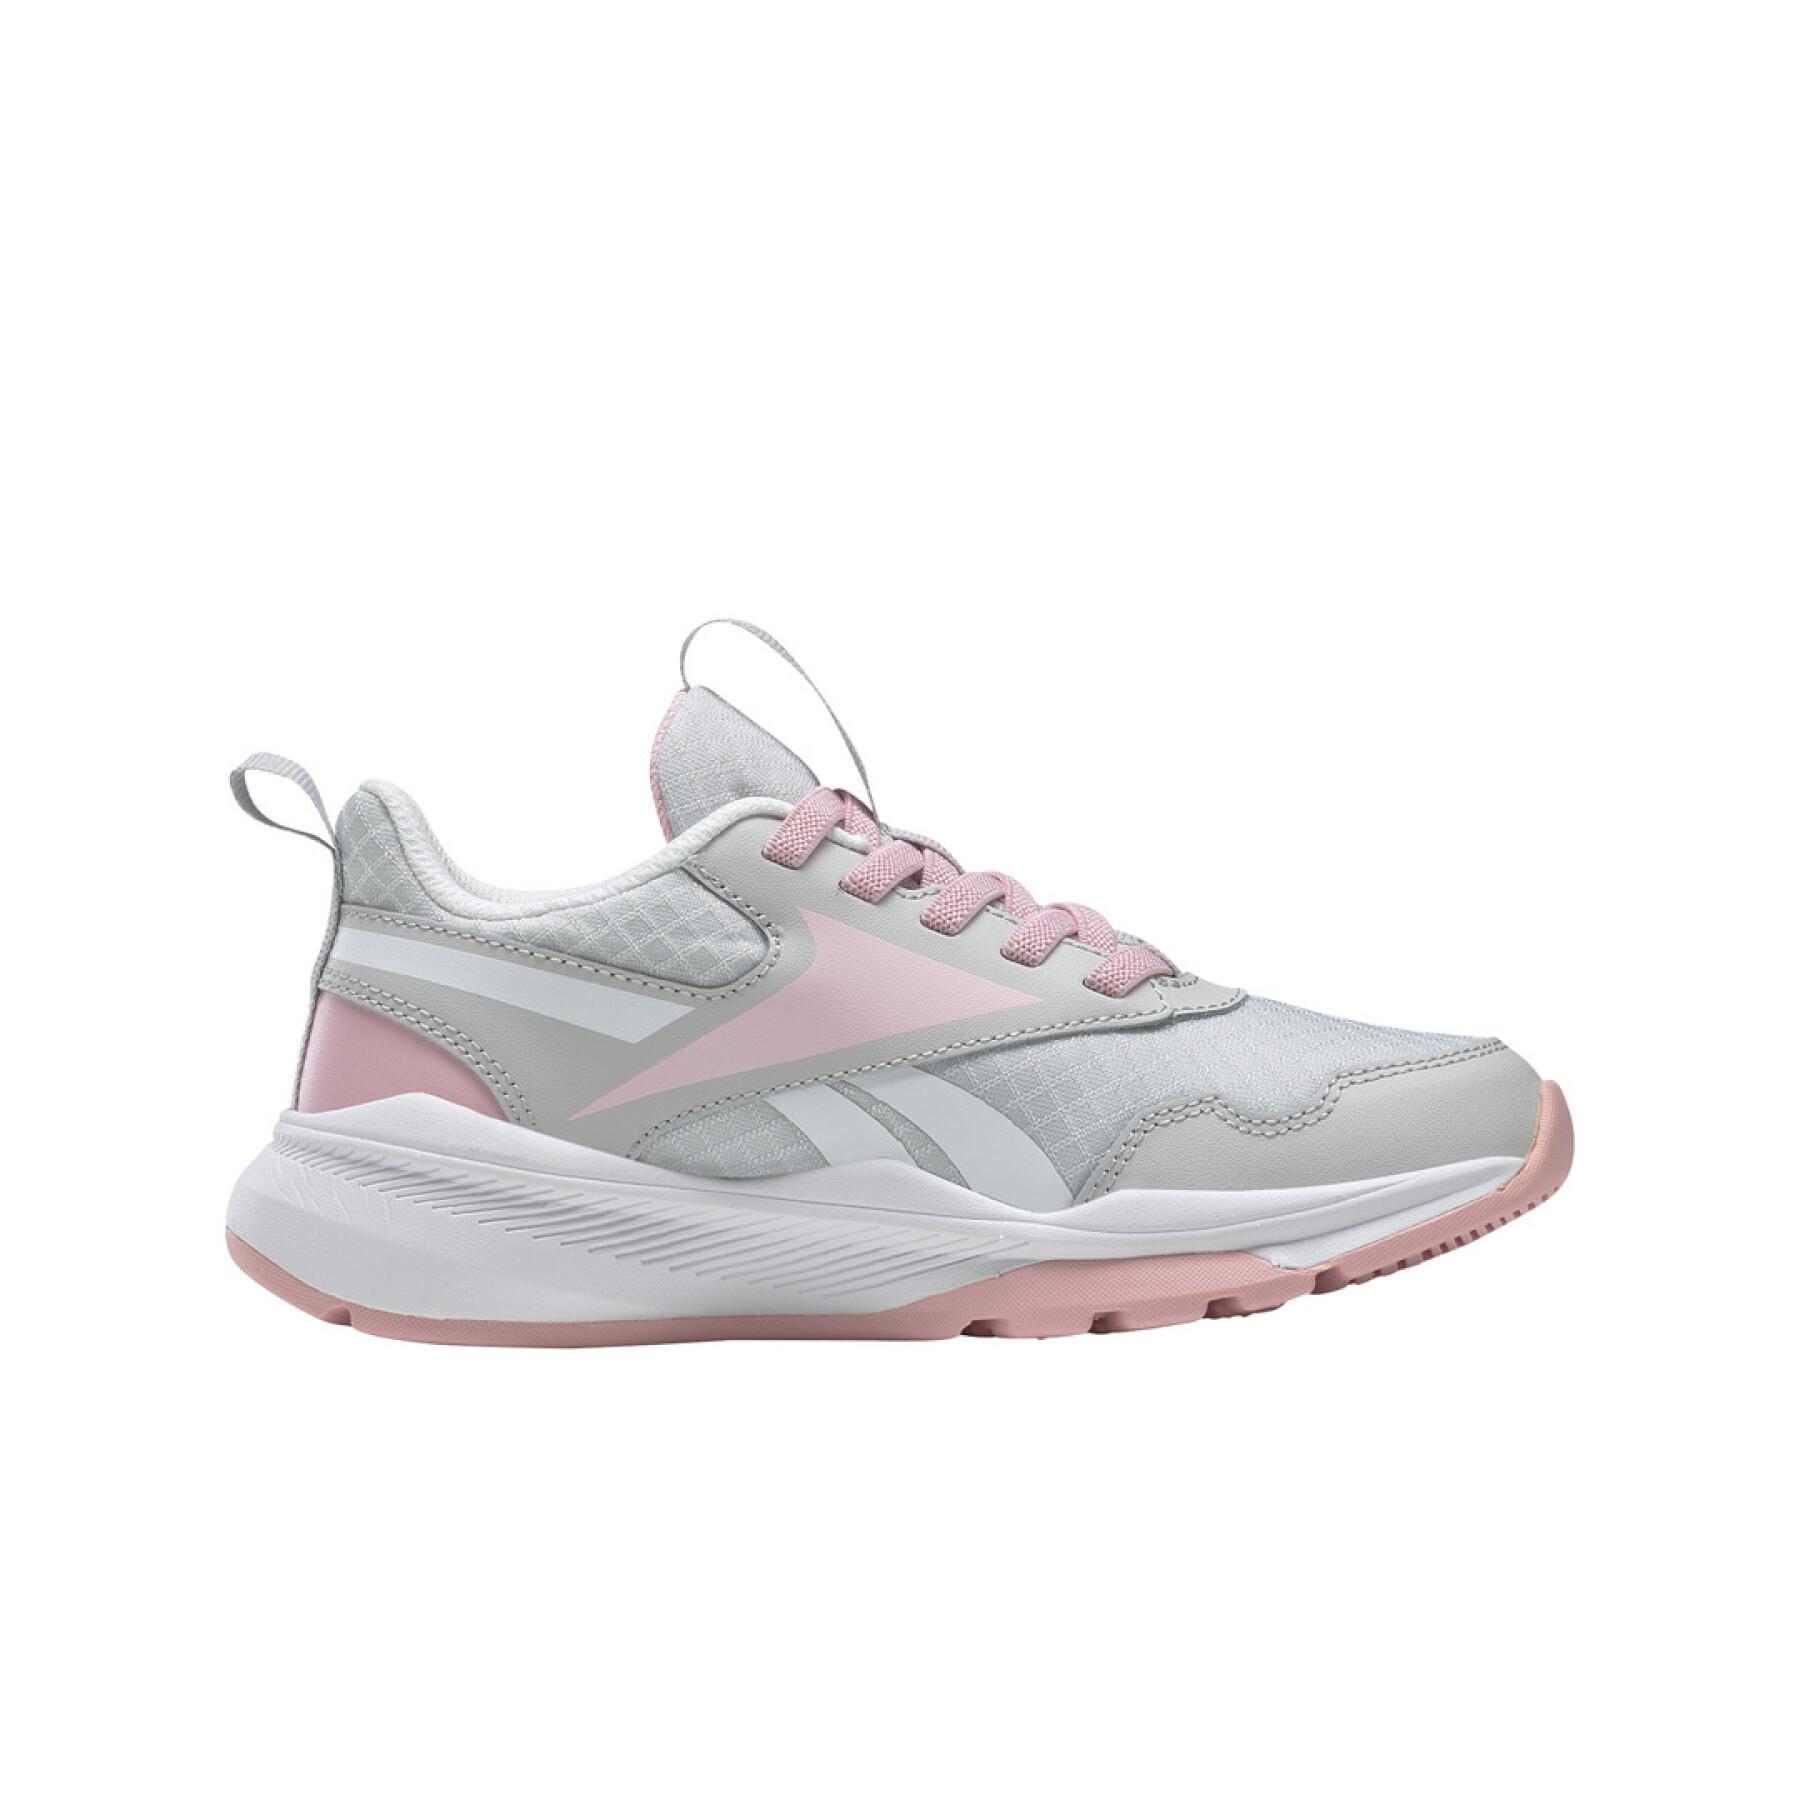 Girl's shoes Reebok XT Sprinter 2